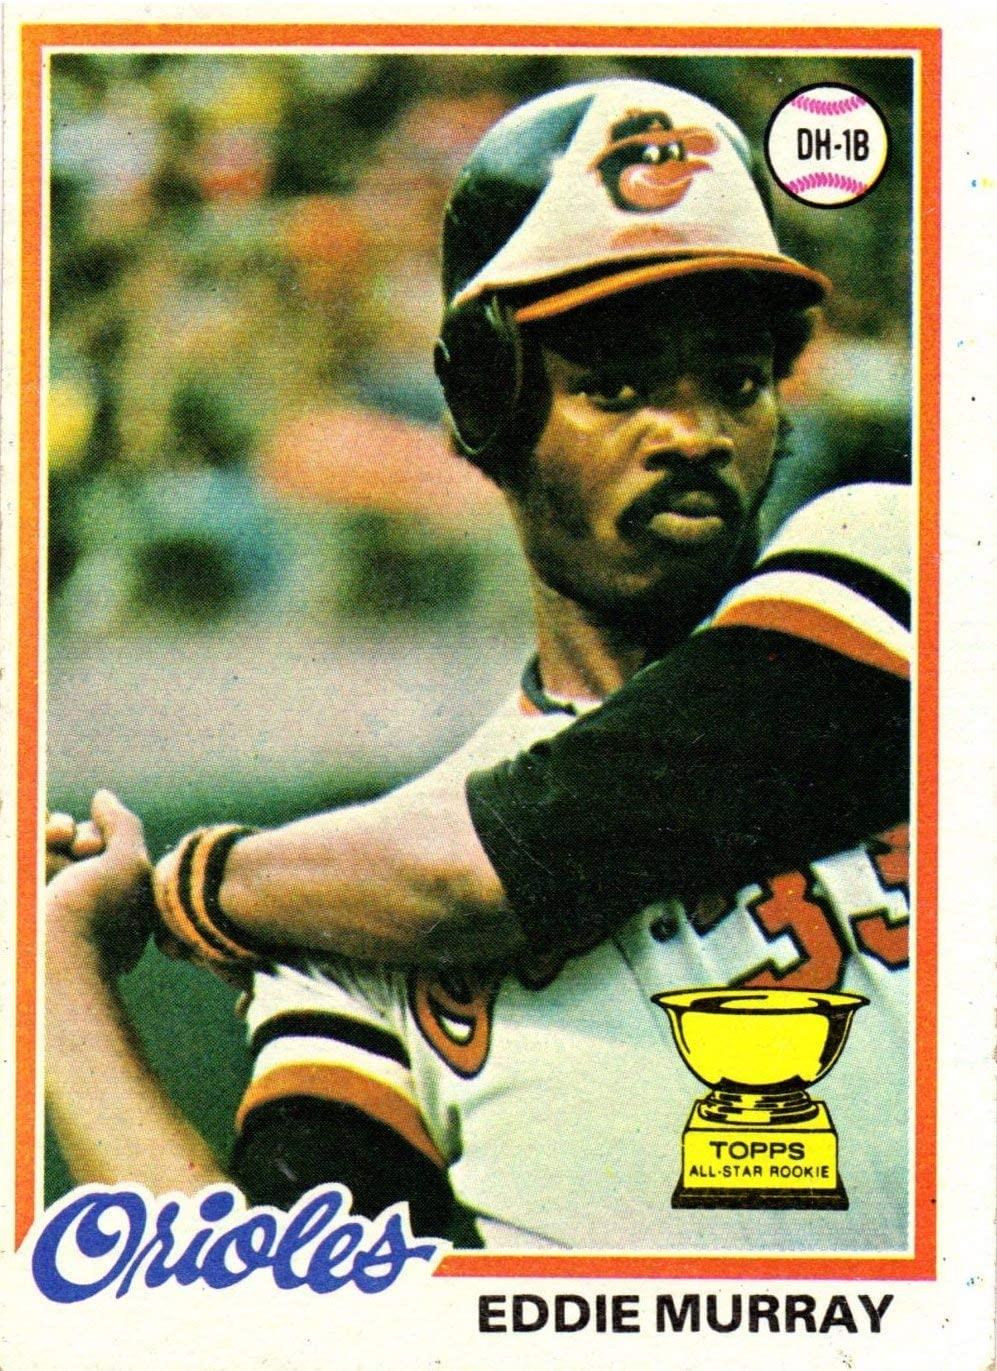 1978 Topps Eddie Murray Rookie Card #36 Baltimore Orioles